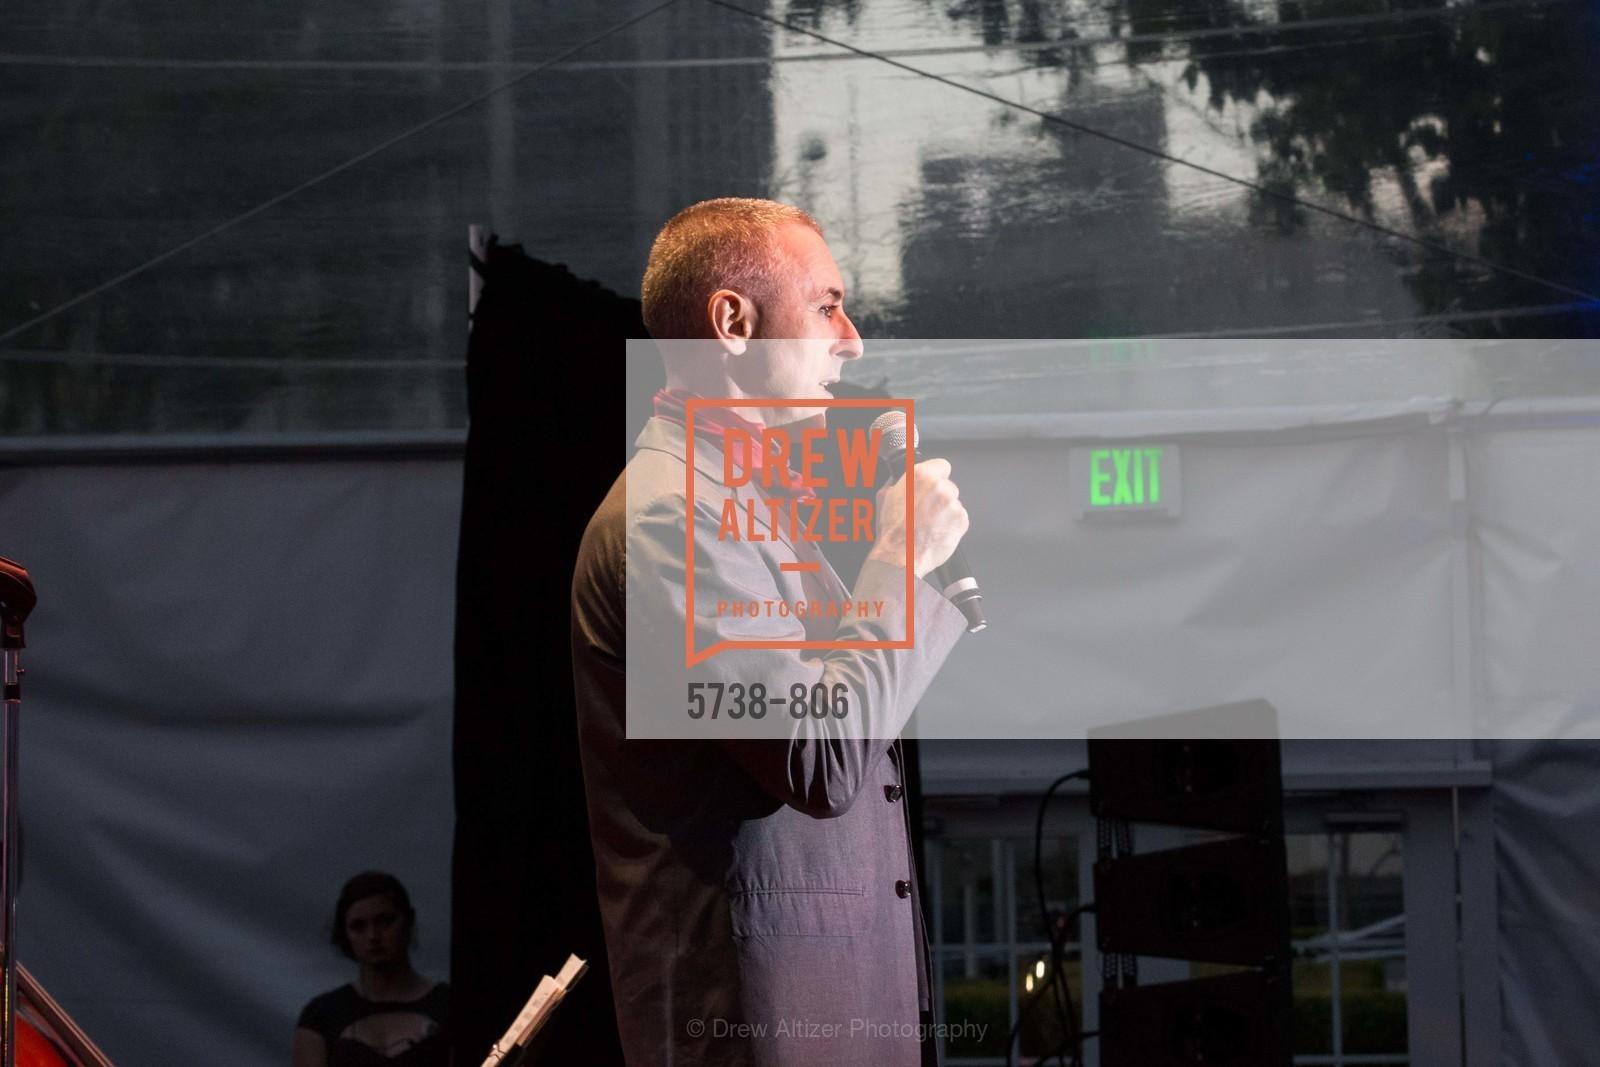 Performance By Alan Cumming, Photo #5738-806